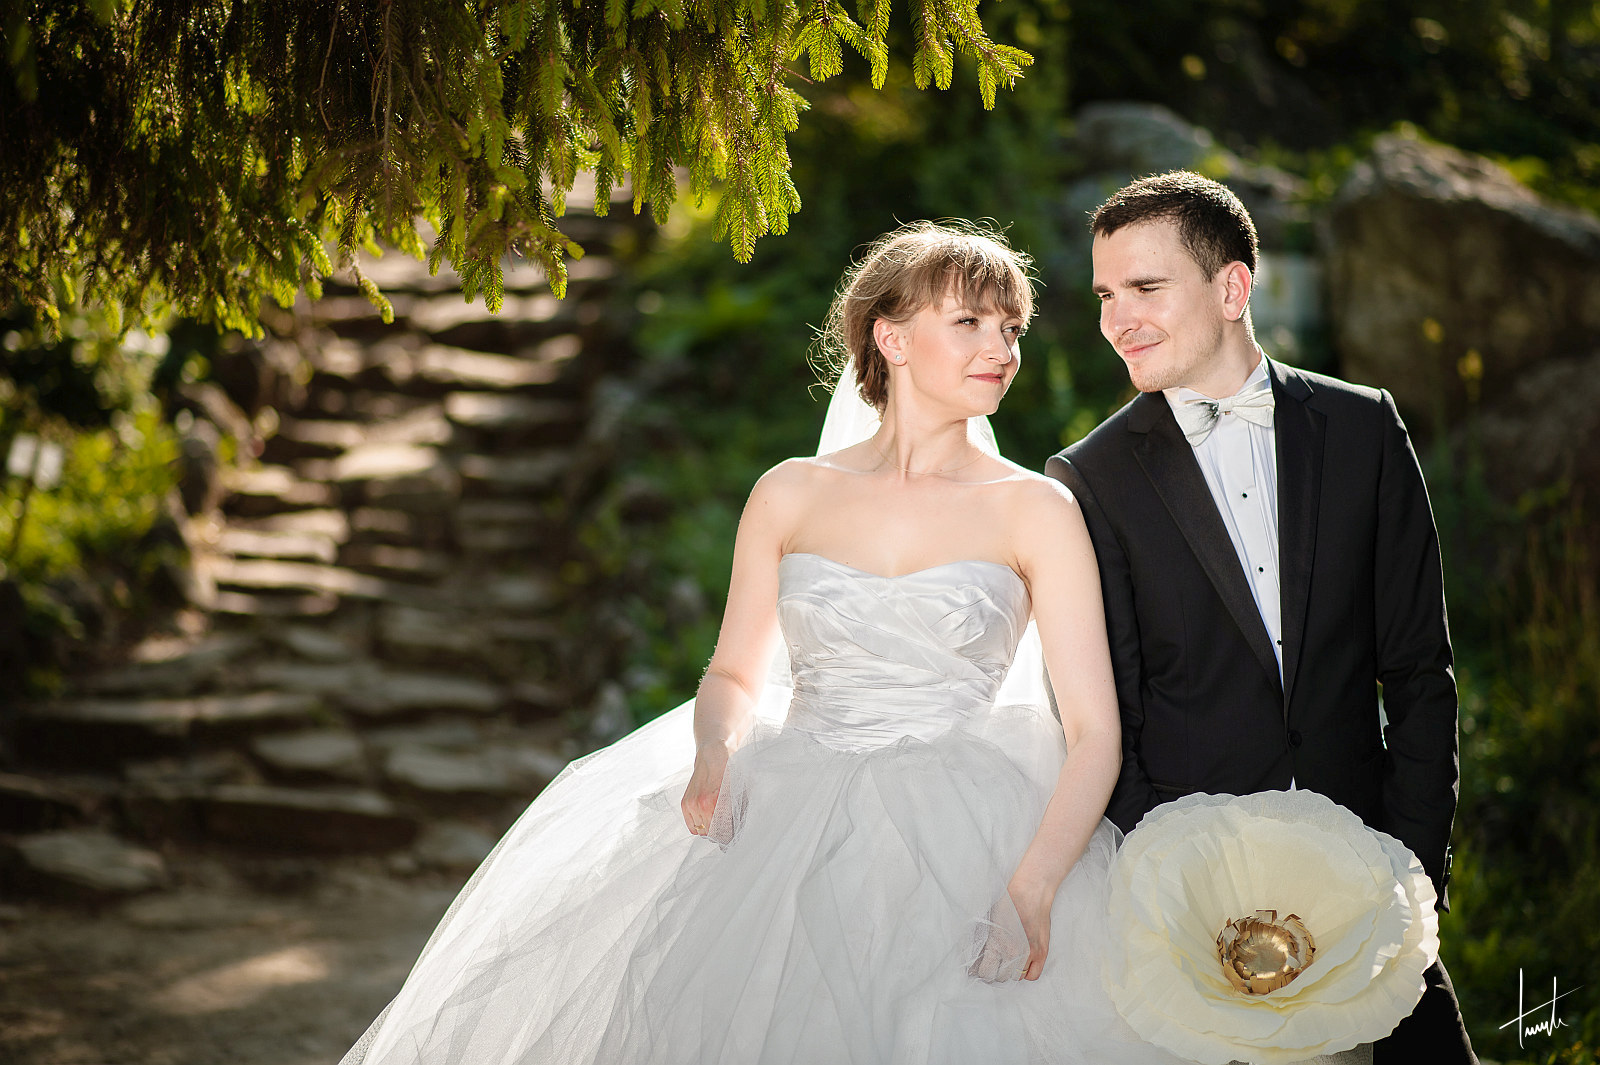 Georgiana Colin - fotografii nunta 02